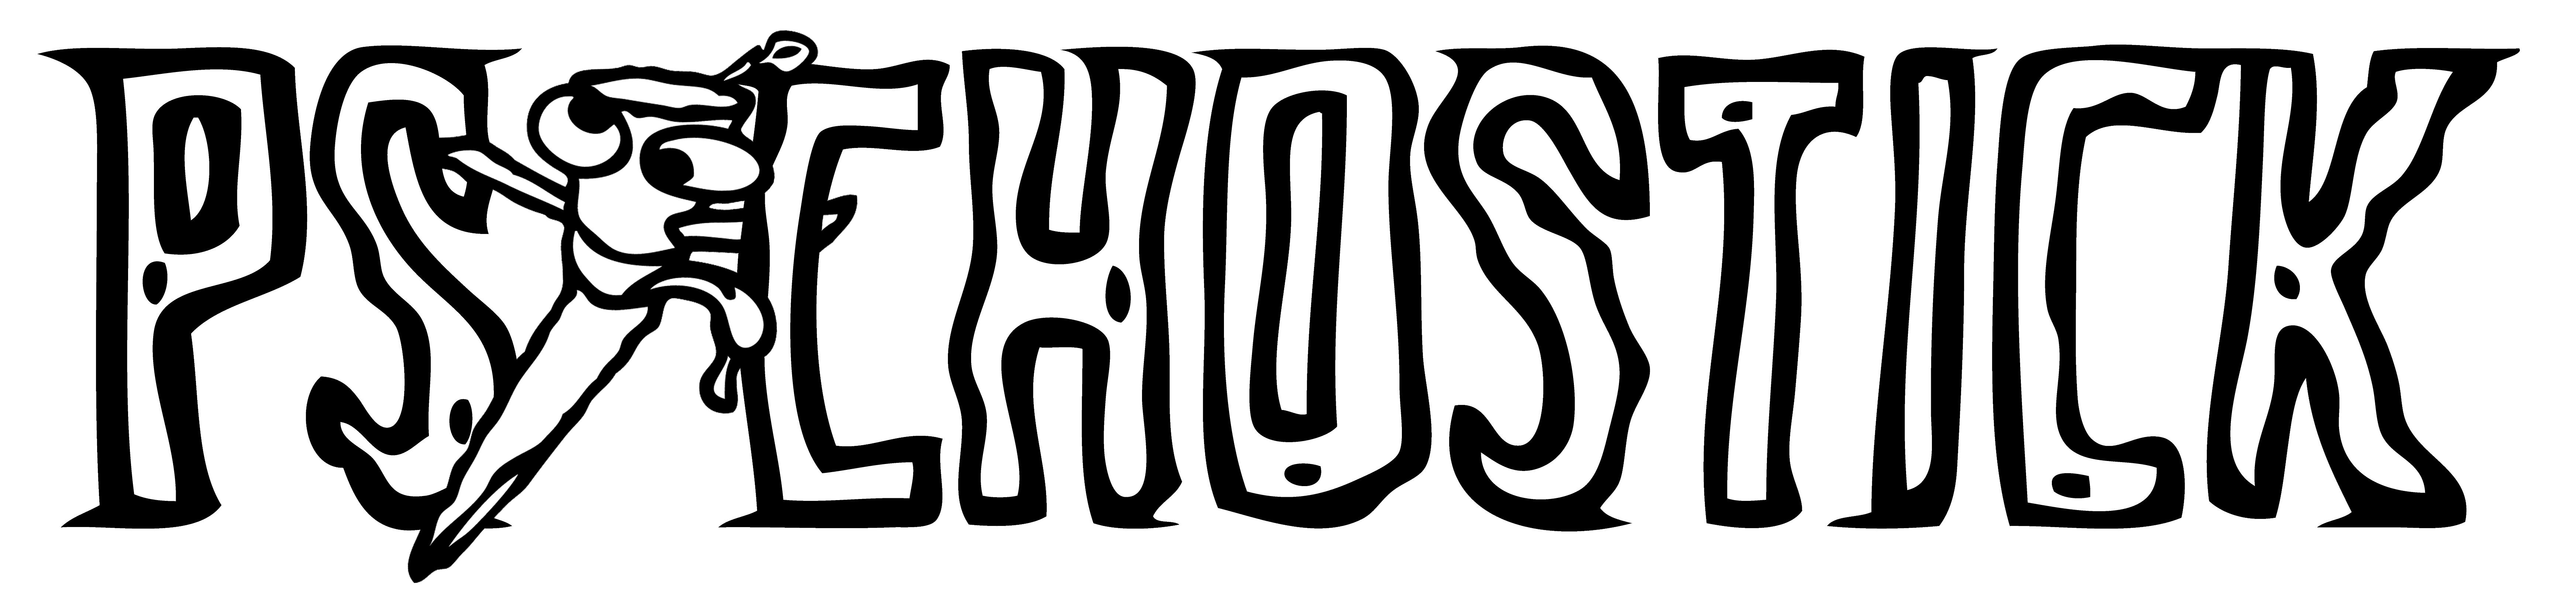 psychostick logo